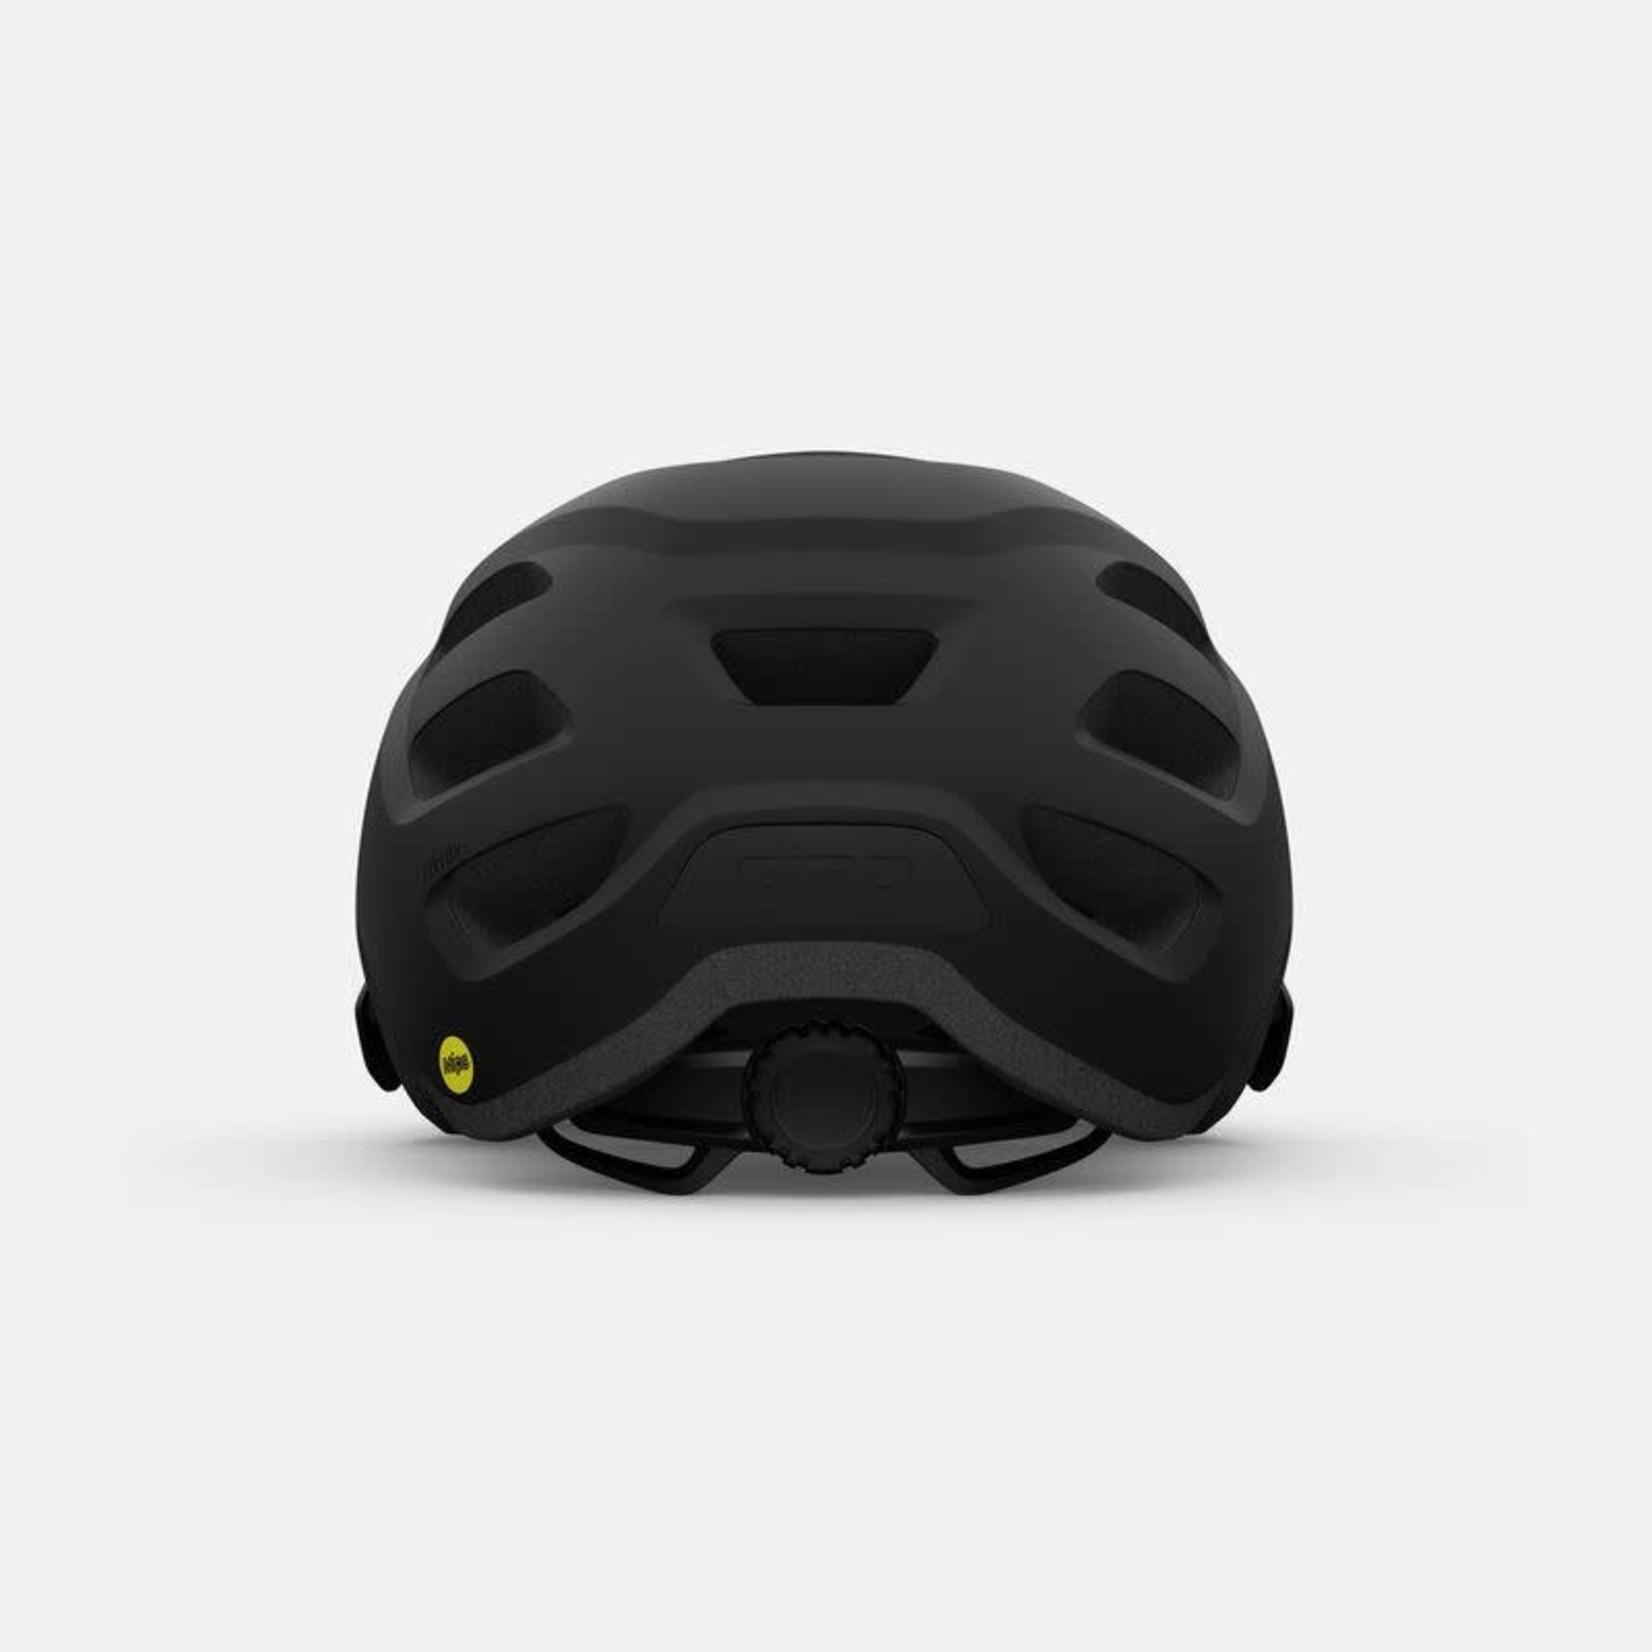 Giro Helmet - Giro Fixture MIPS - Universal Size (54-61cm)